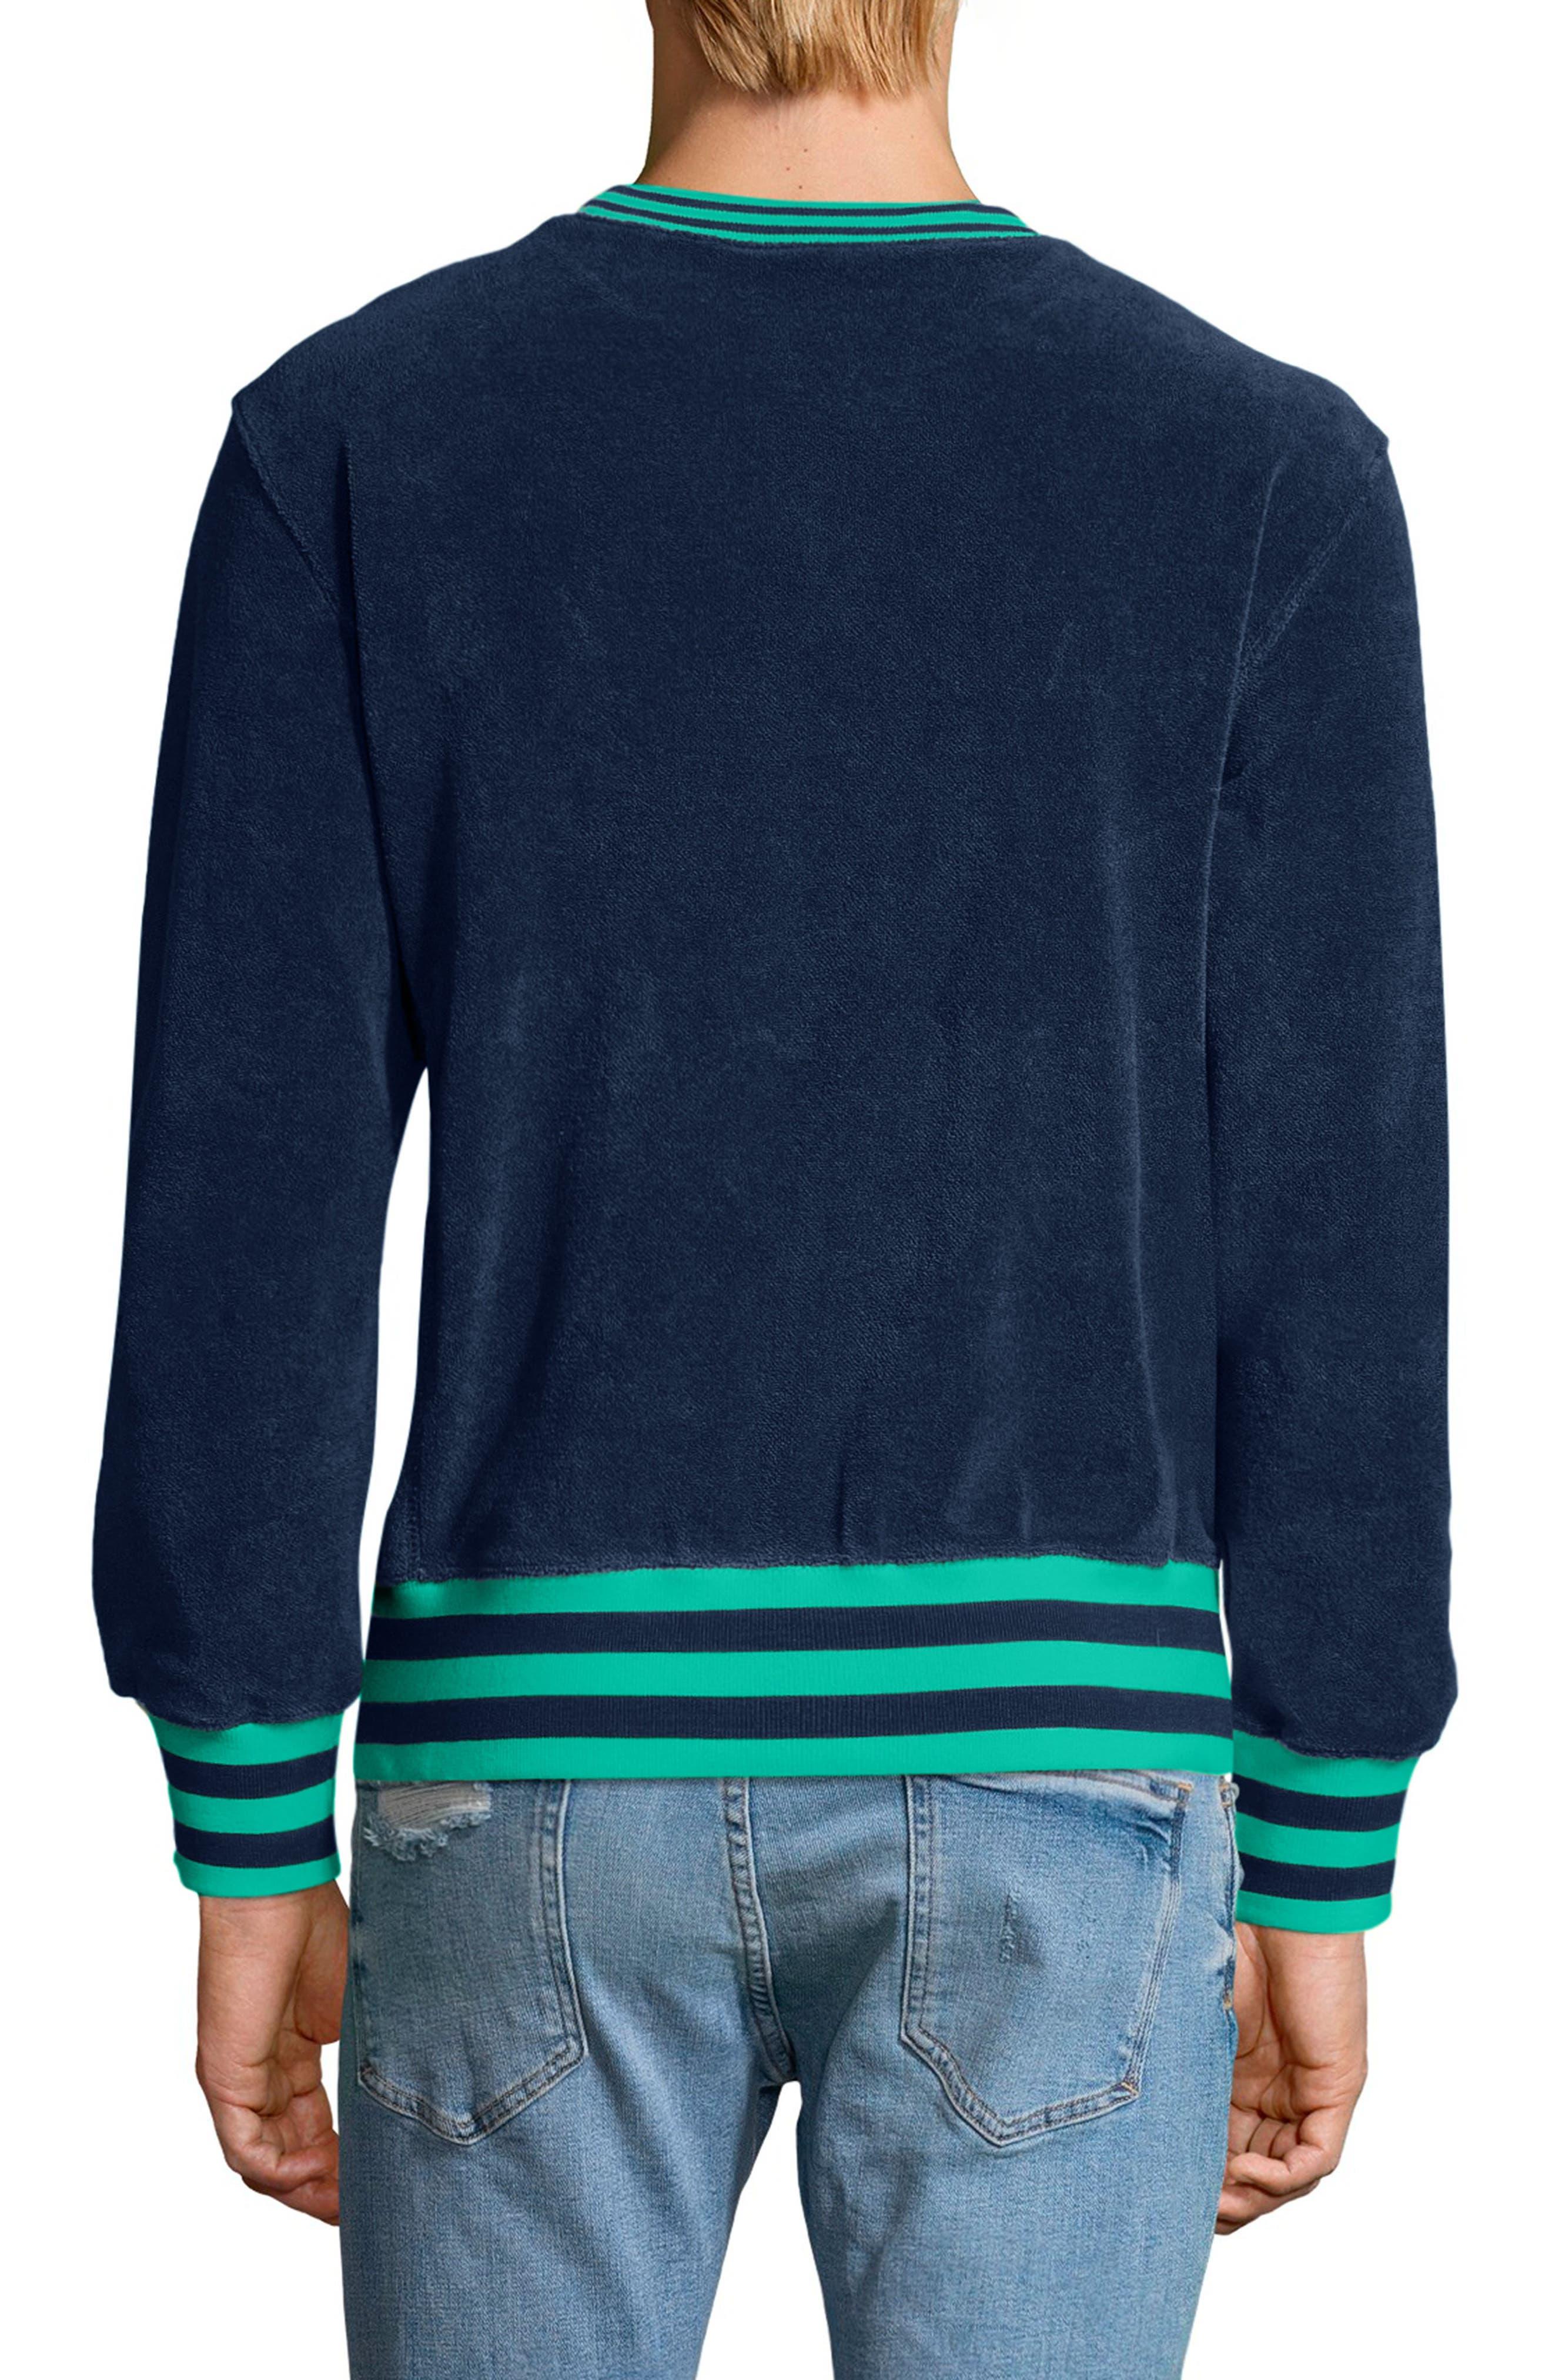 Sponge Terry Crewneck Sweatshirt,                             Alternate thumbnail 2, color,                             Navy